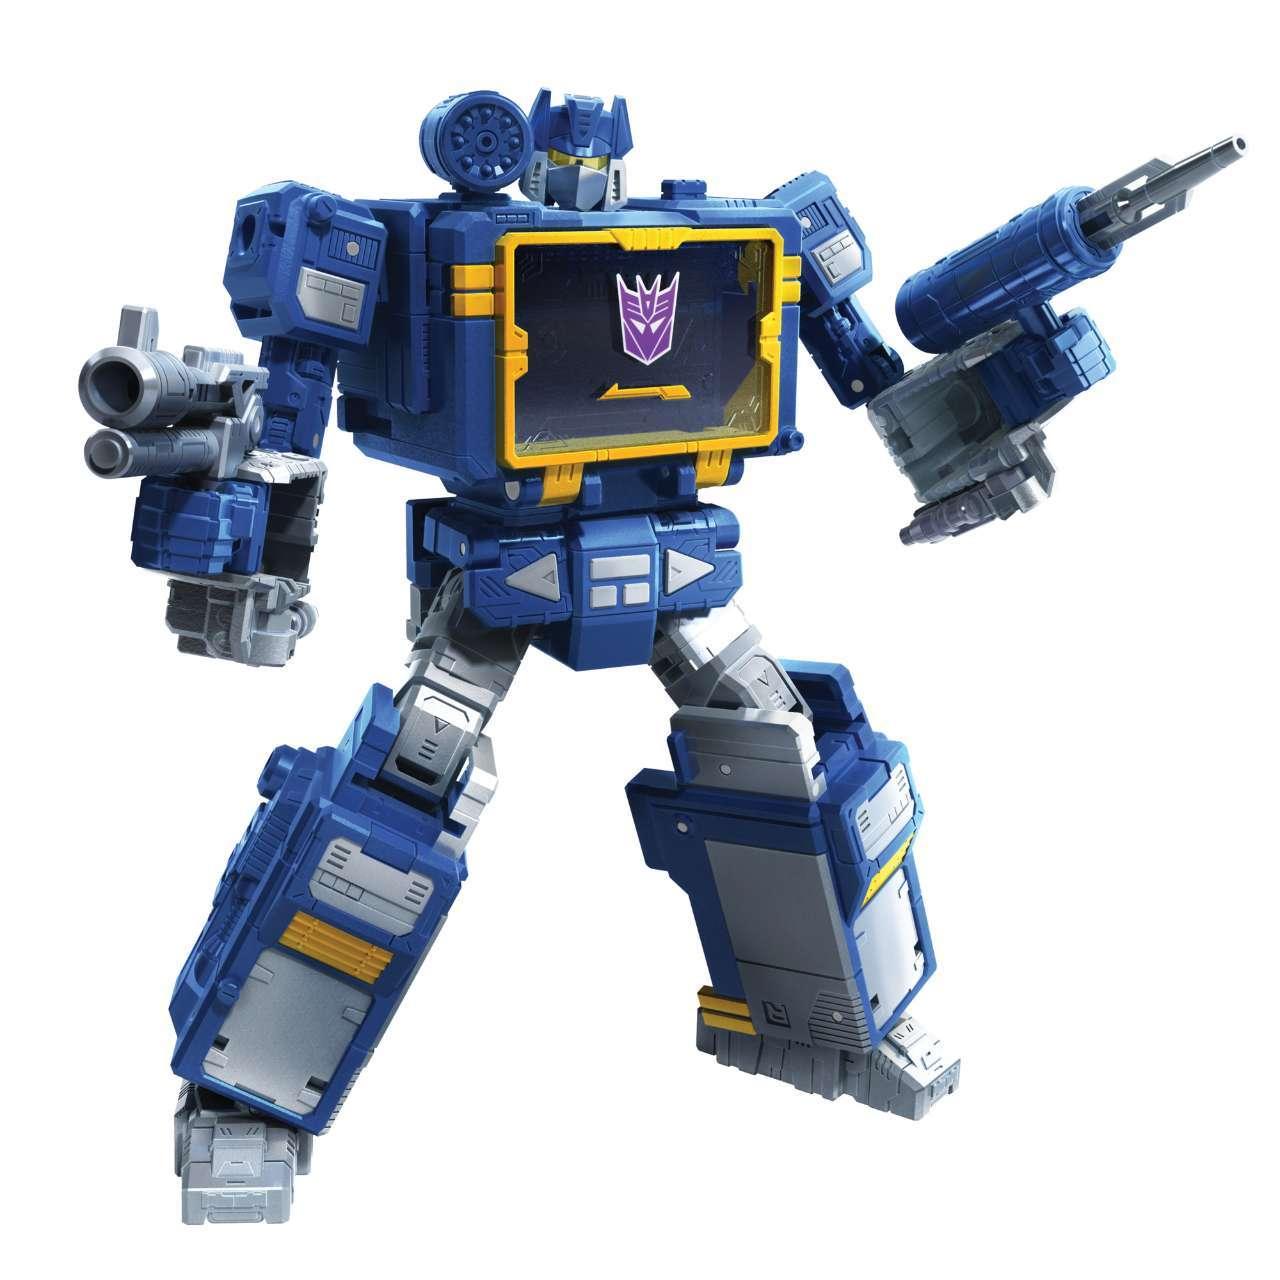 Transformers War for Cybertron Netflix BUMBLEBEE  Walmart Earthrise IN HAND